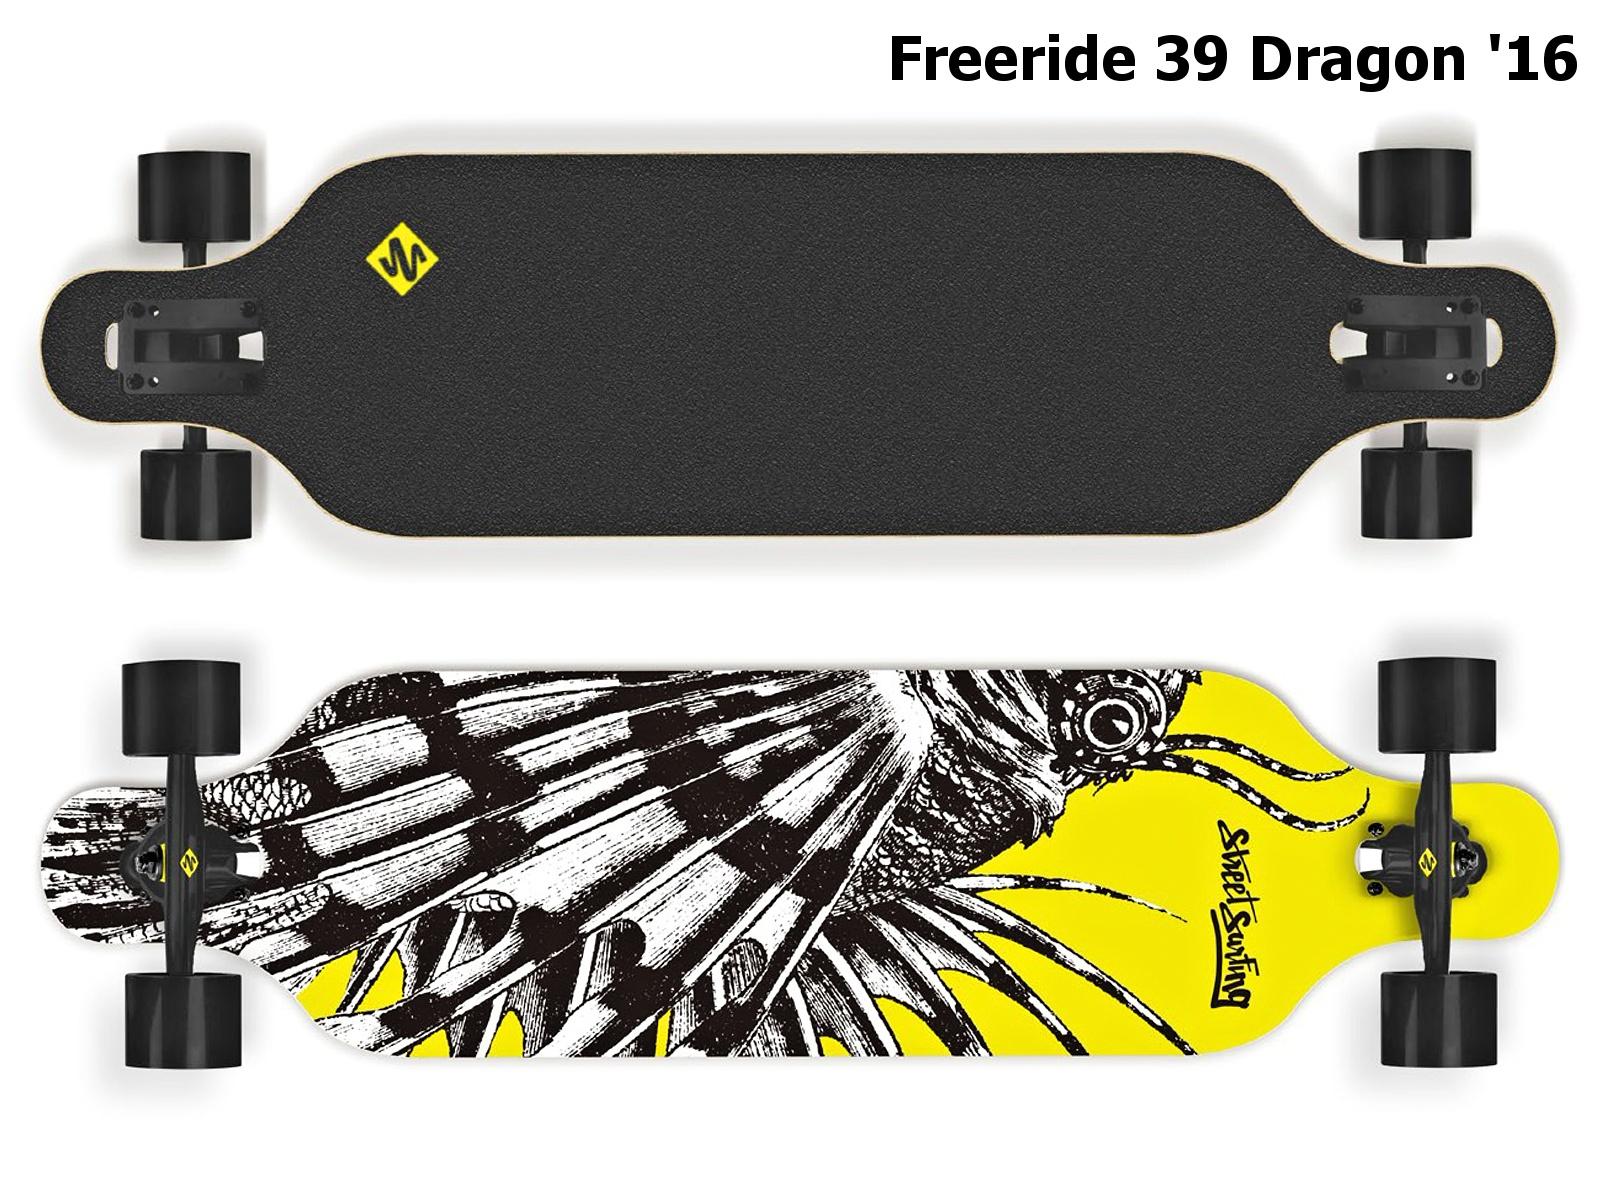 Longboard STREET SURFING Freeride 39 Dragon - žlutý 2016